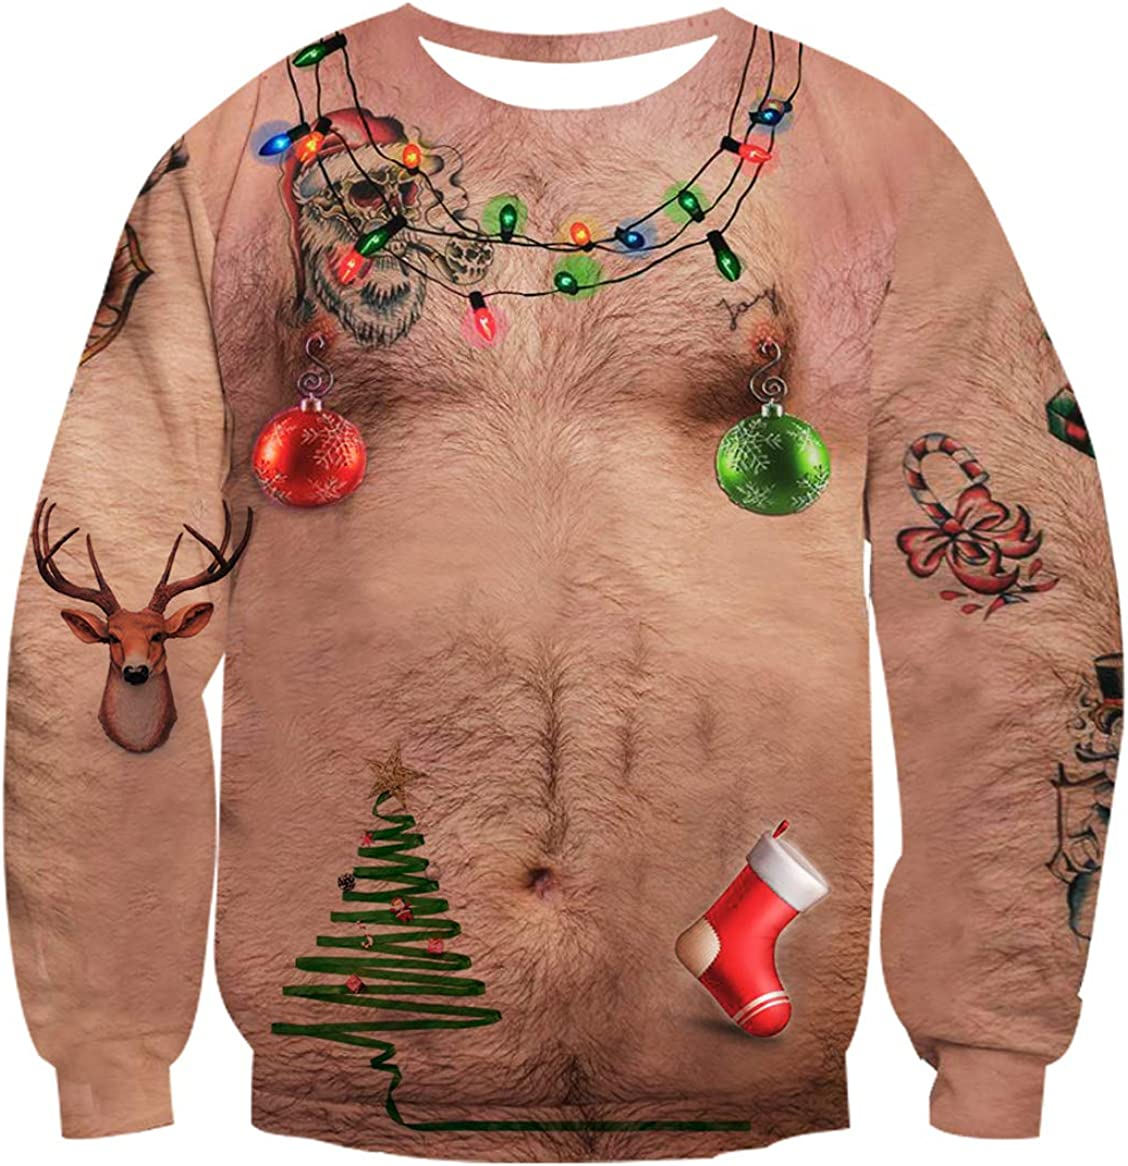 uideazone Men Women Funny Ugly Sweatshirts New life Christmas Genuine Digital 3D